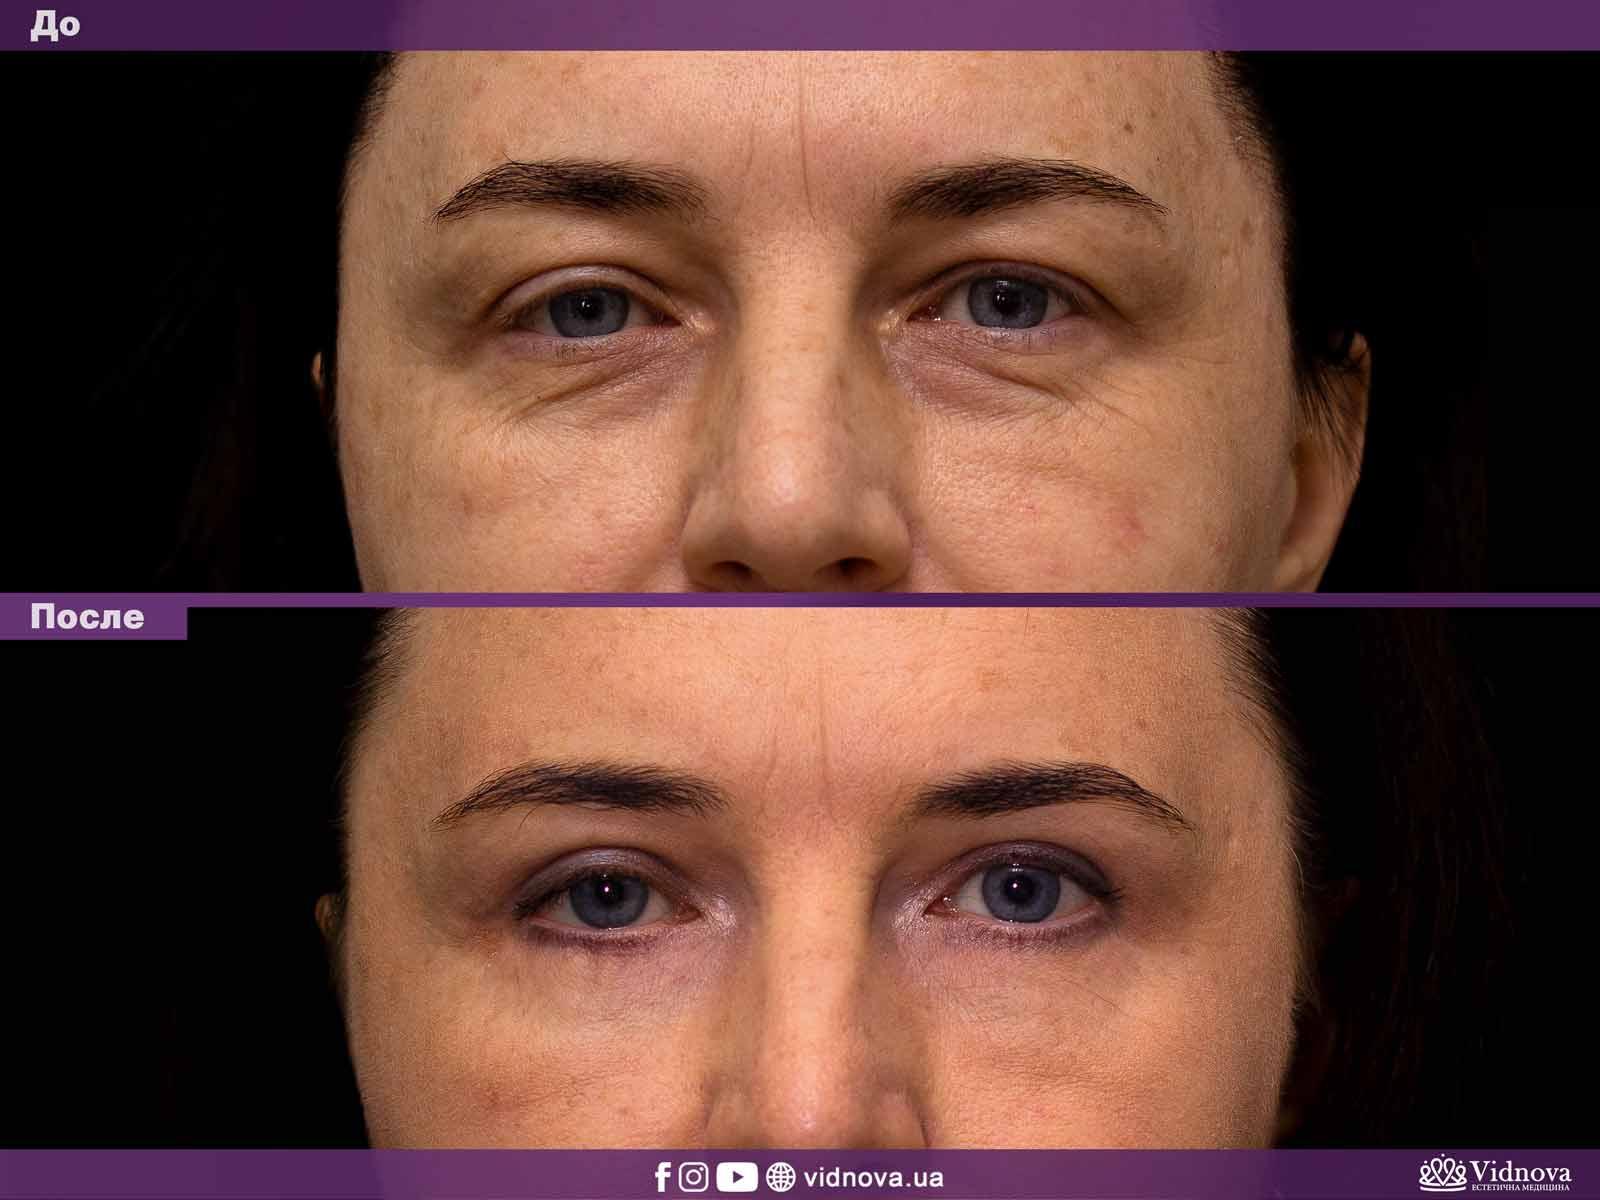 Блефаропластика: Фото До и После - Пример №7-1 - Клиника Vidnova